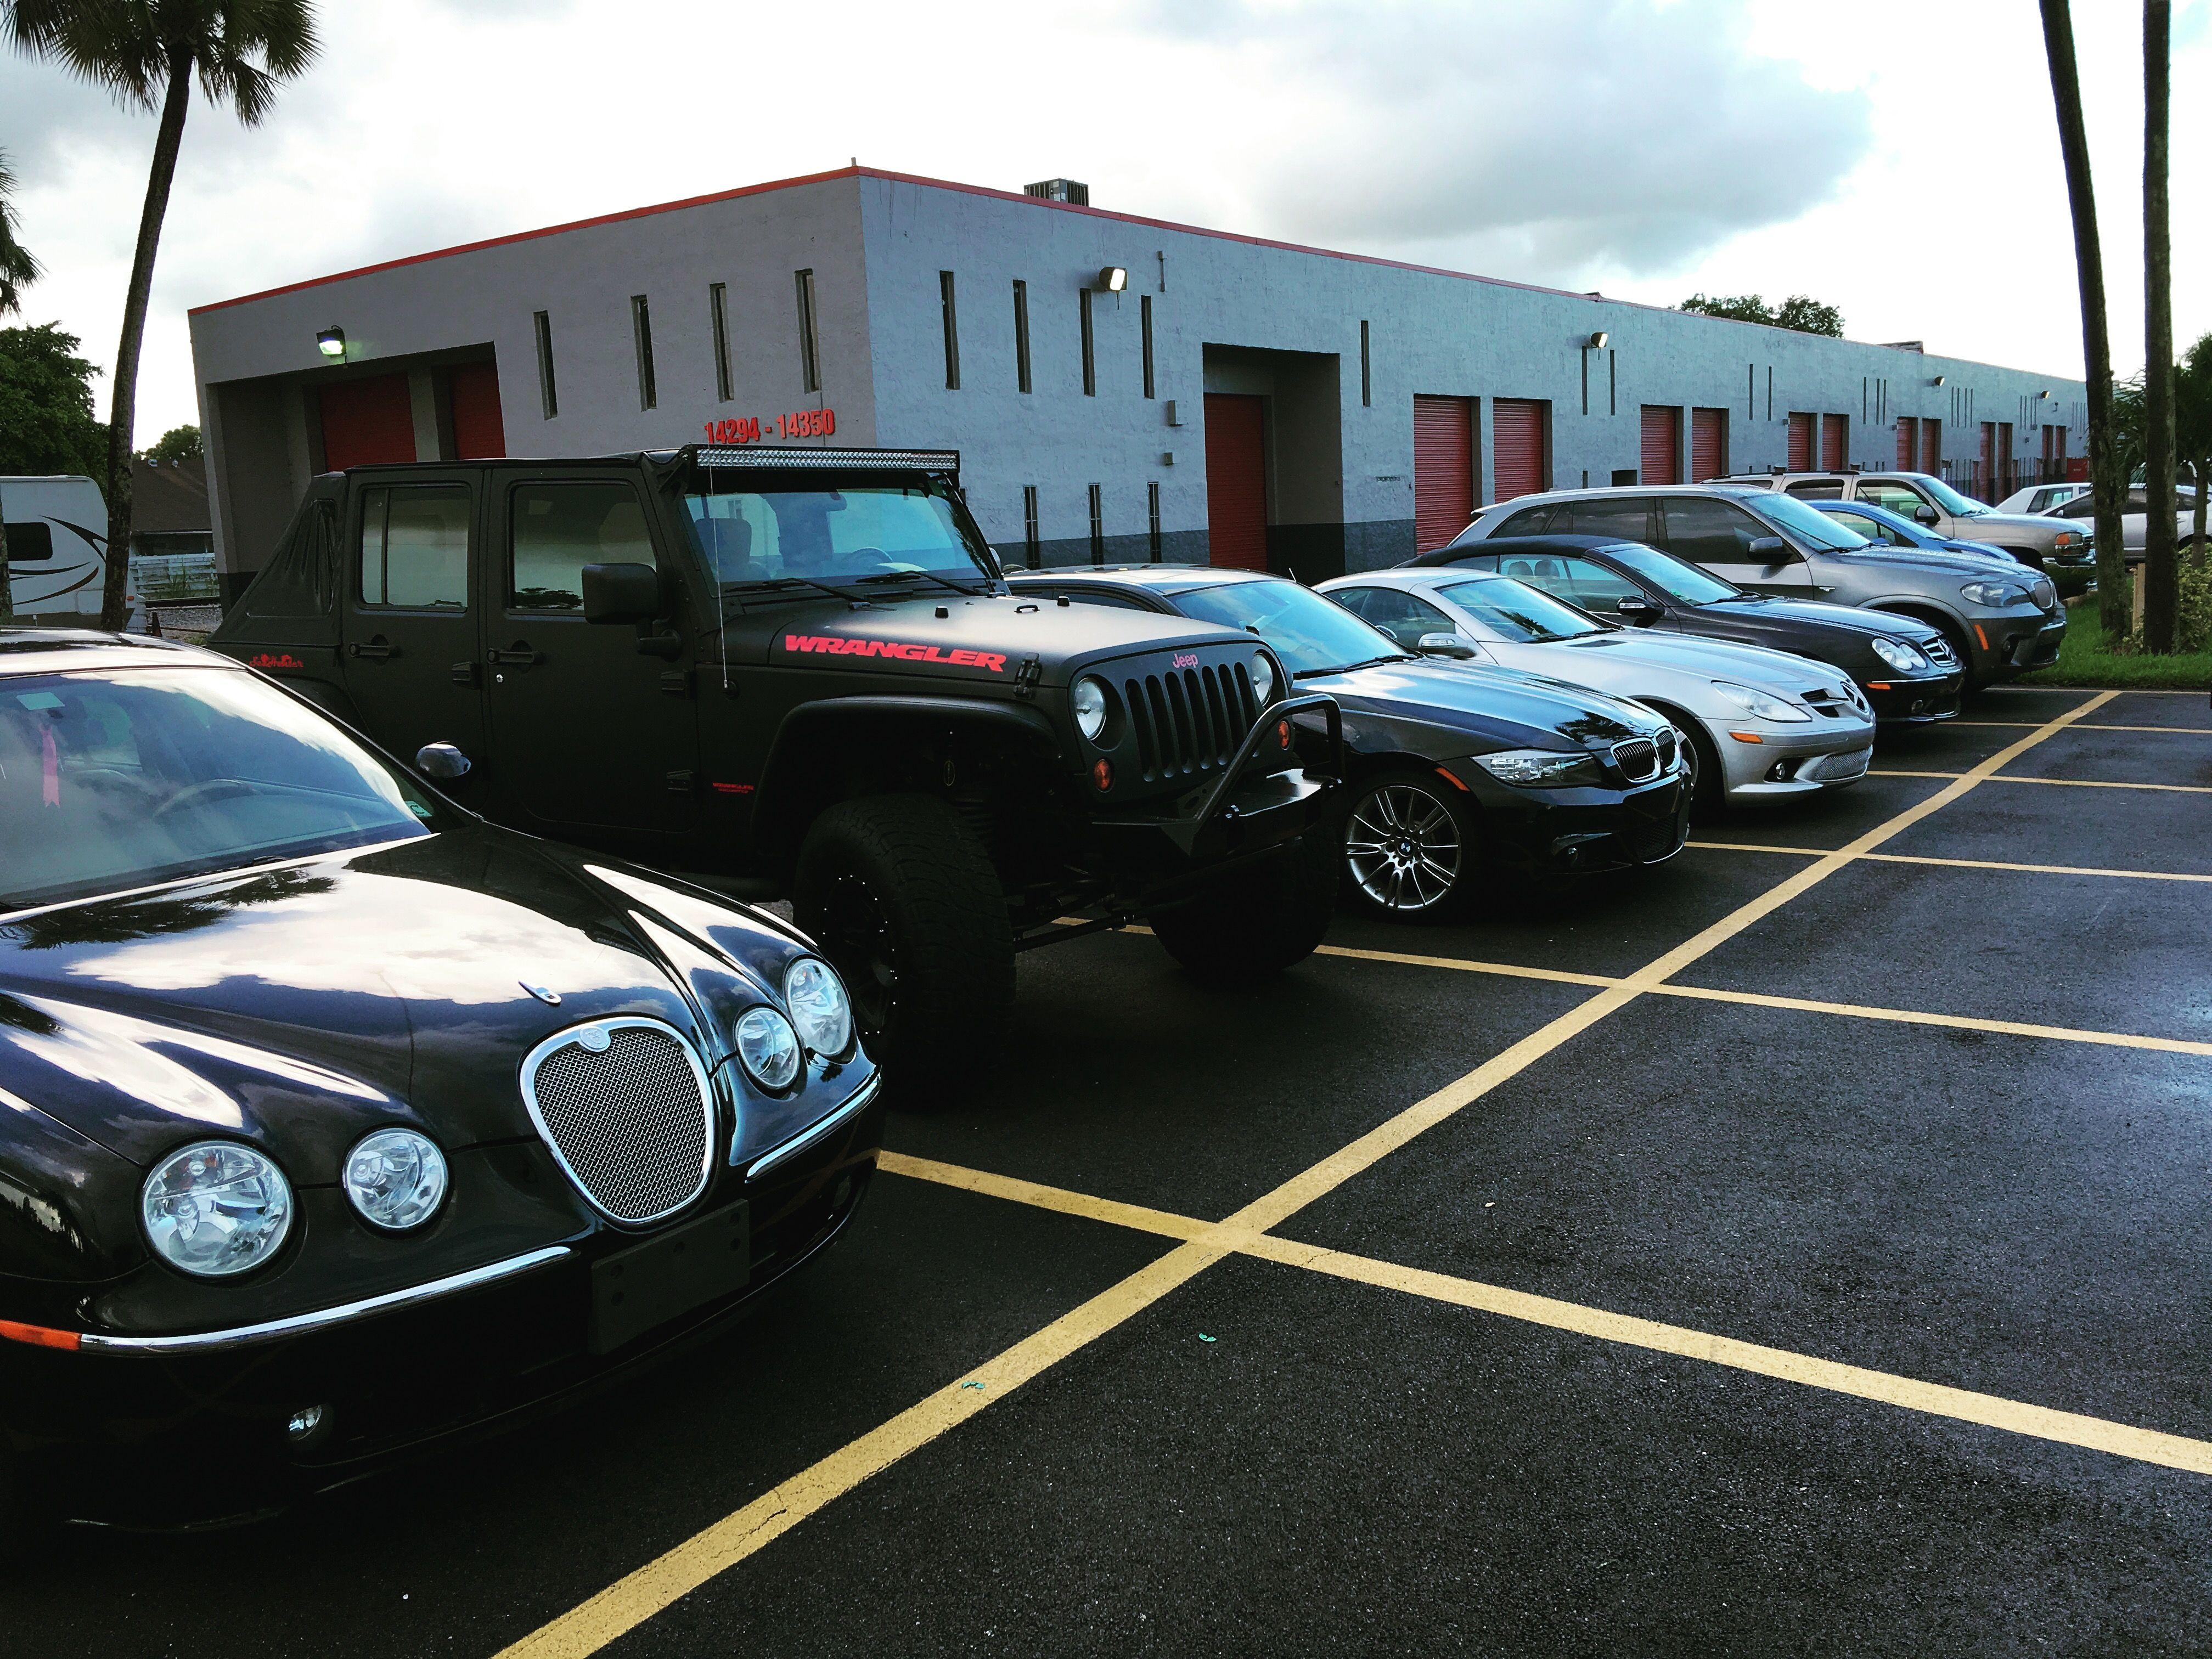 Full house today! #jaguar #jeep #bmw #mercedesbenz #cars #autos #autorepair #prestigeautotech